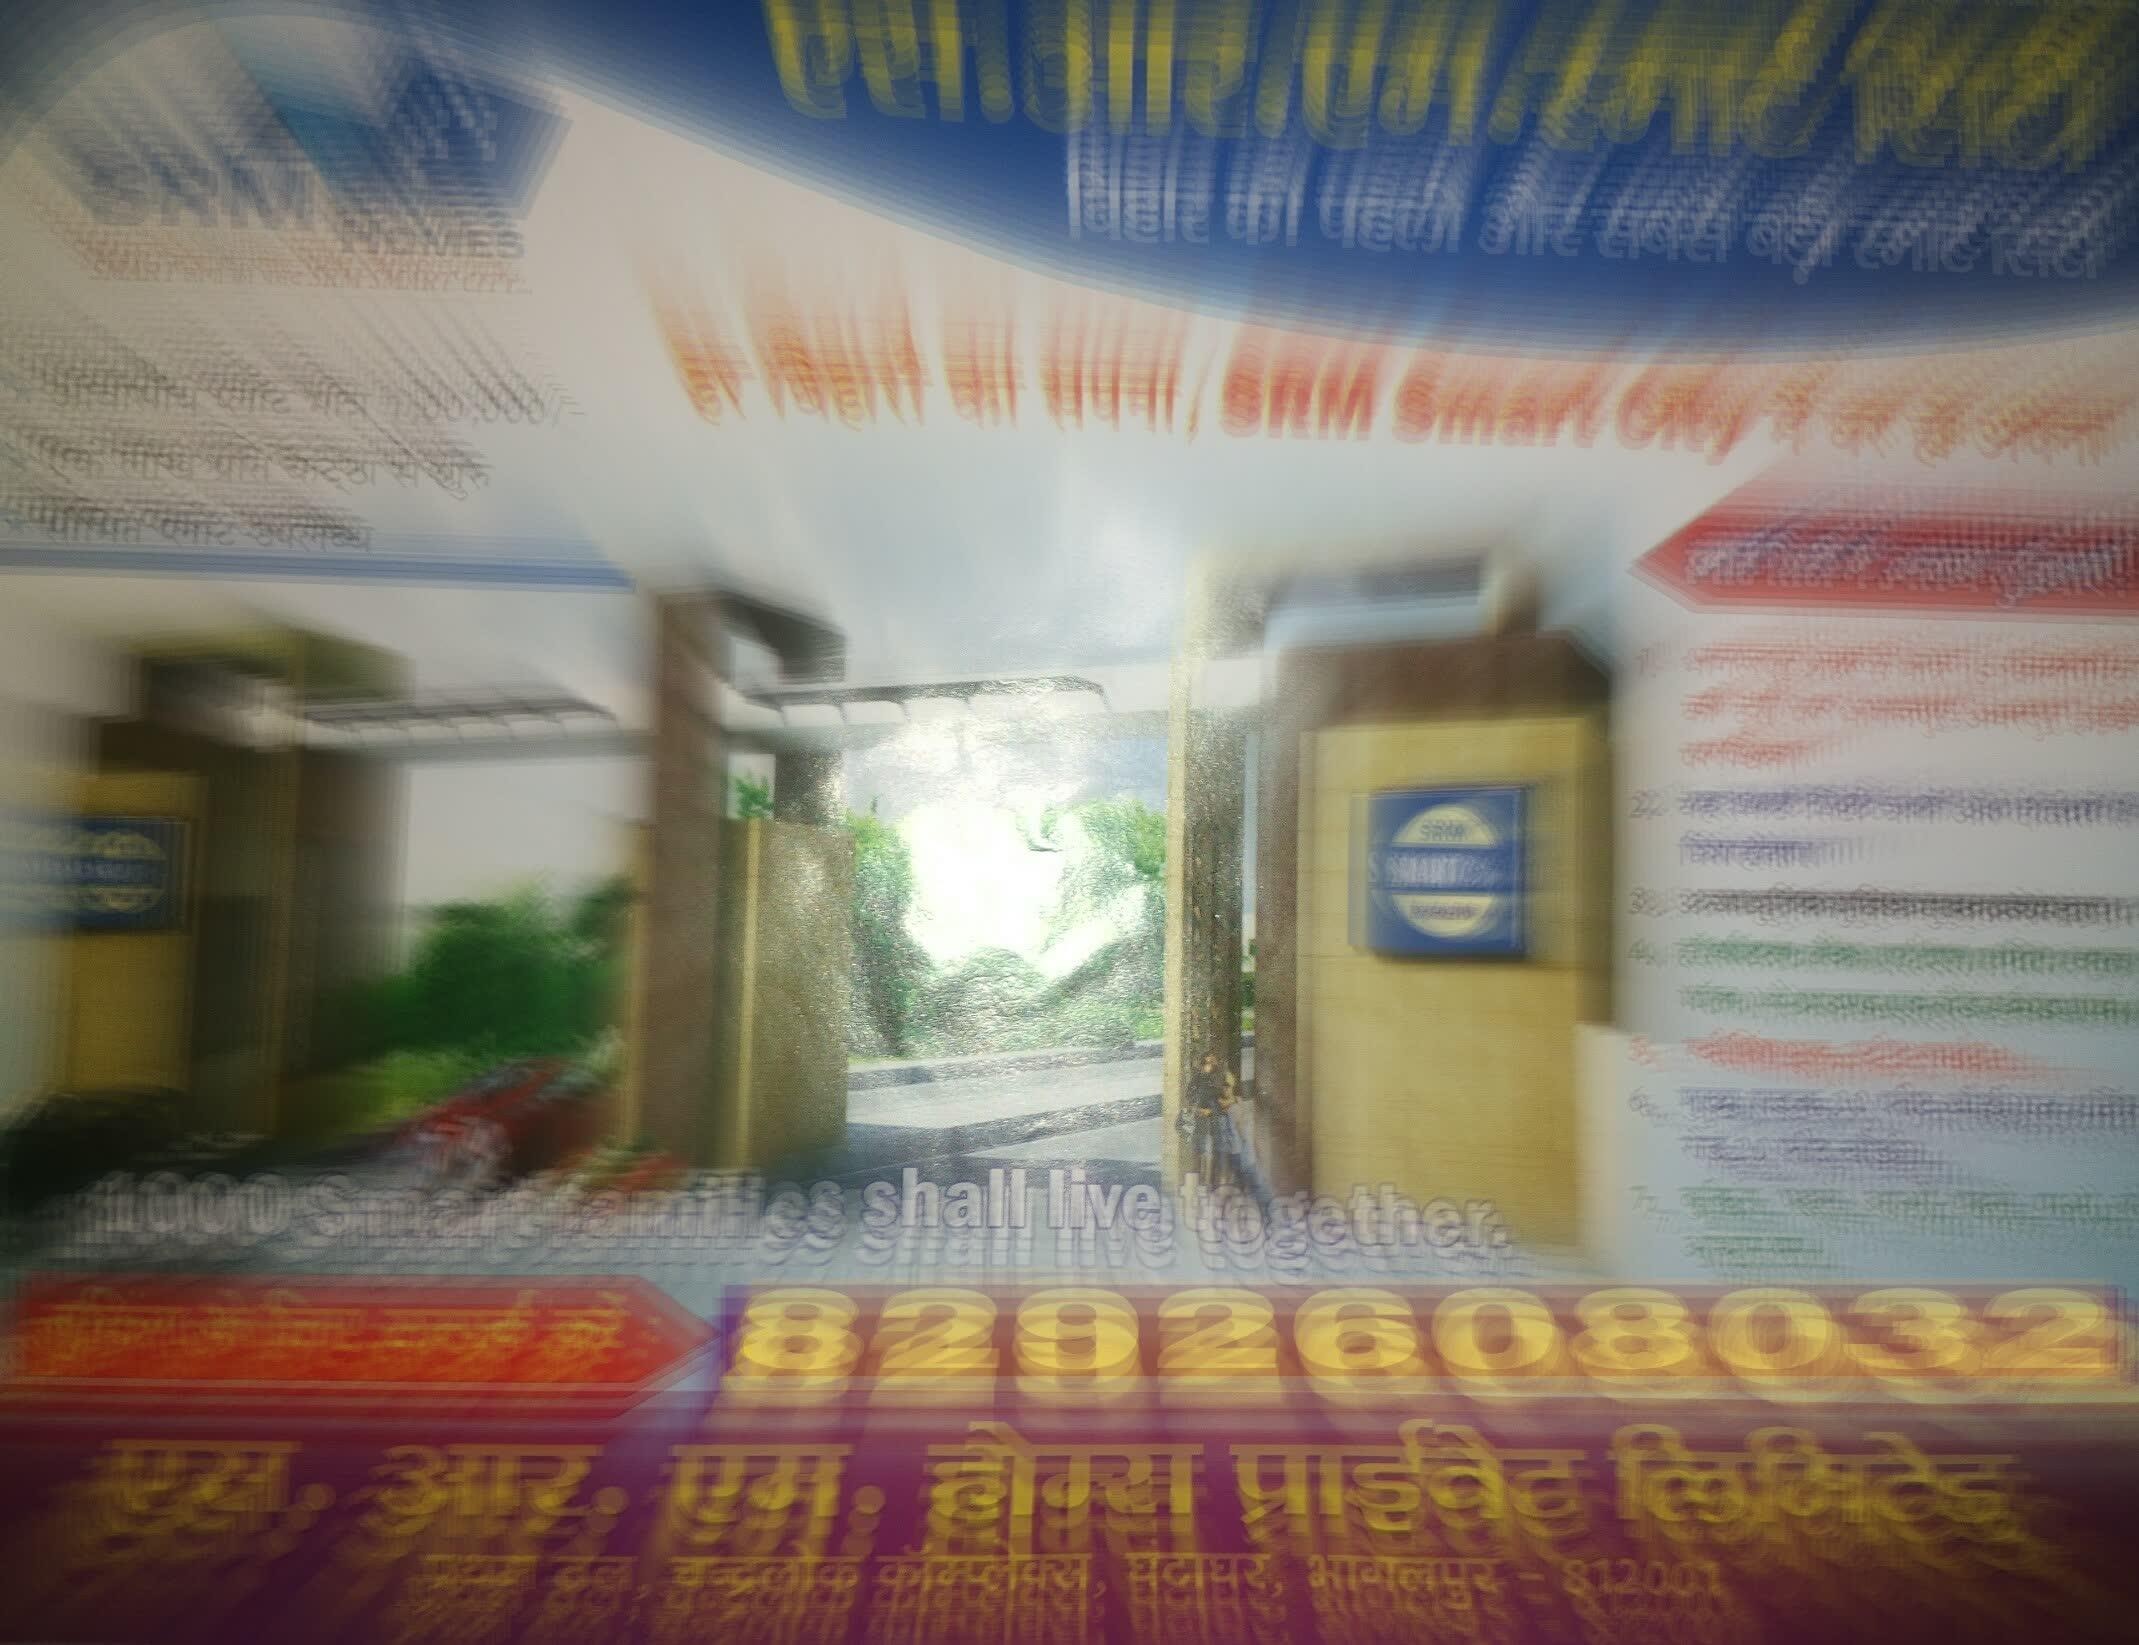 URGENT SELL OF 5 BIGHA PLOT - NATHNAGAR IN SMART CITY BHAGALPUR HURRY CALL 4 DETAILS